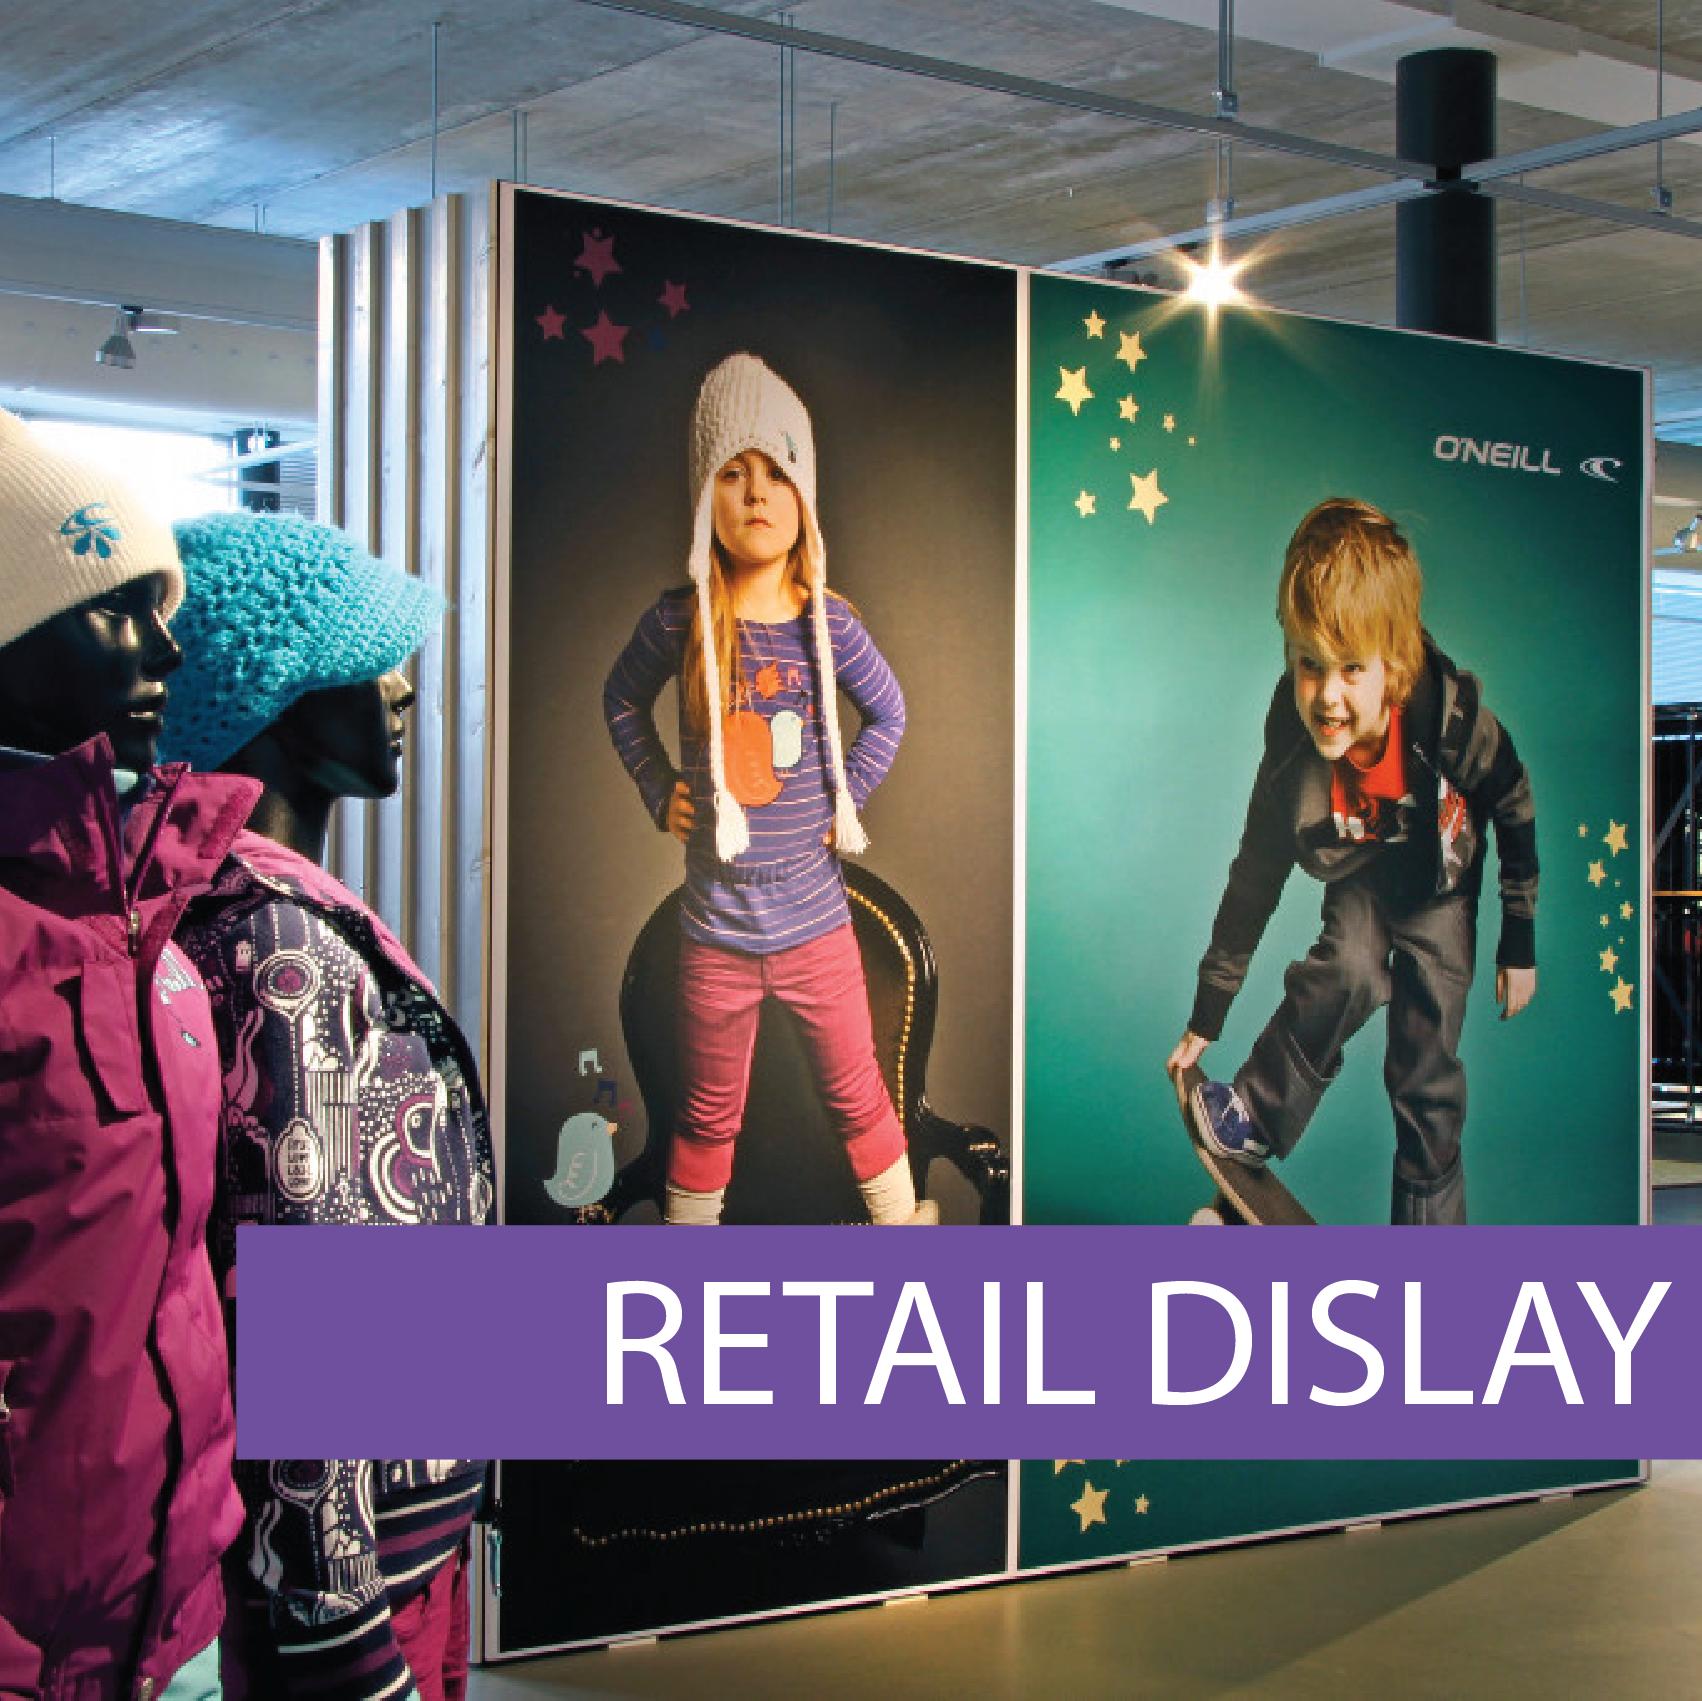 Frameless retail displays